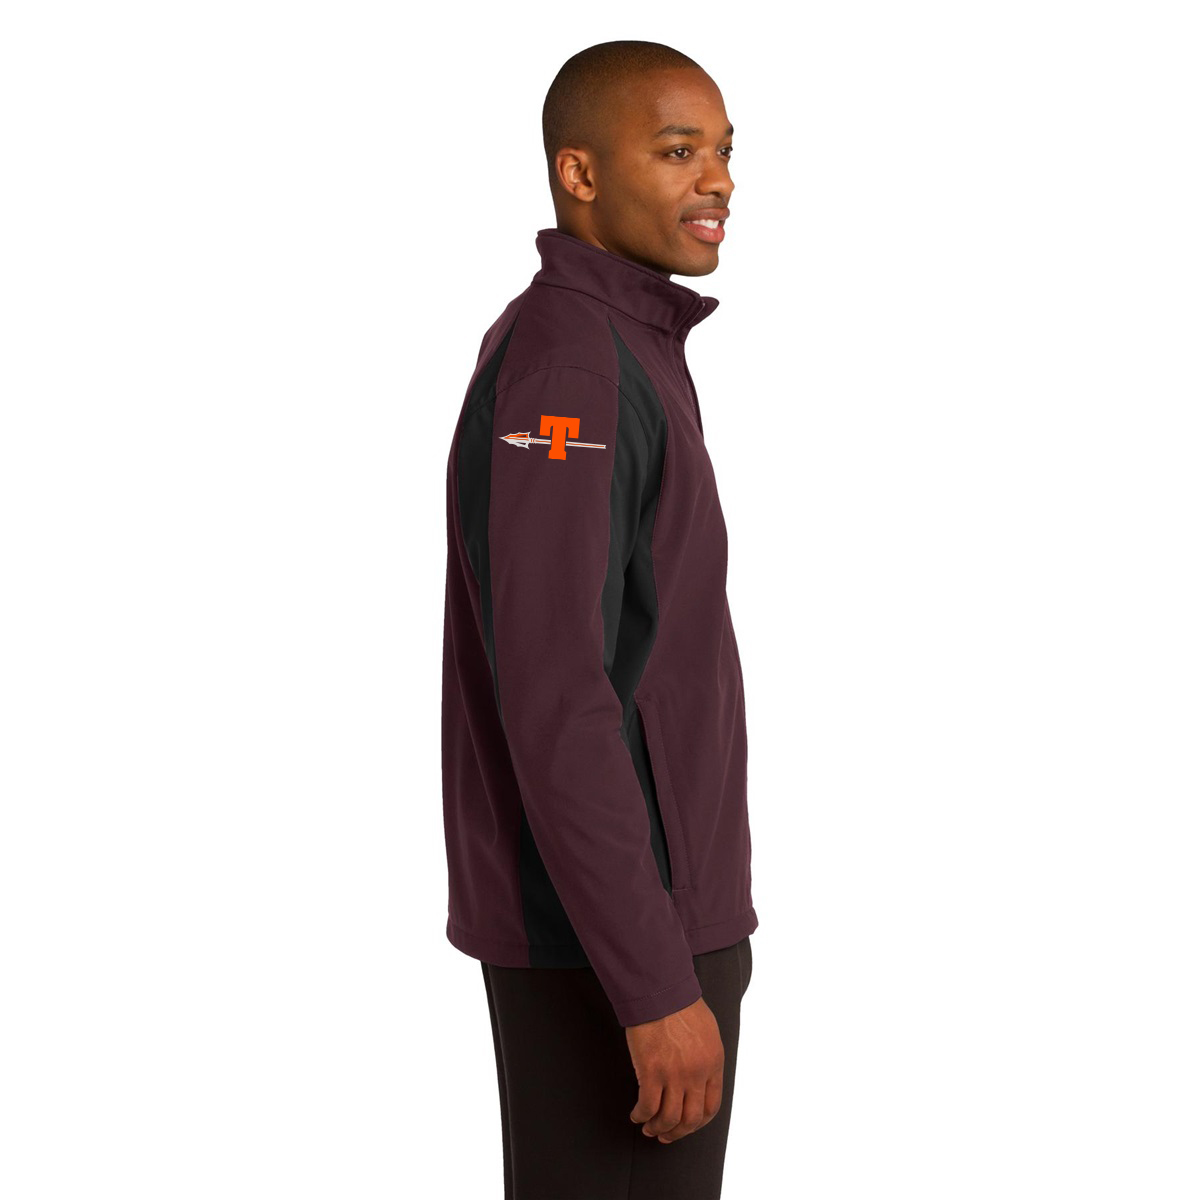 e0eb739762a Teton Redskins Football – ST970 Water-resistant Soft Shell Jacket